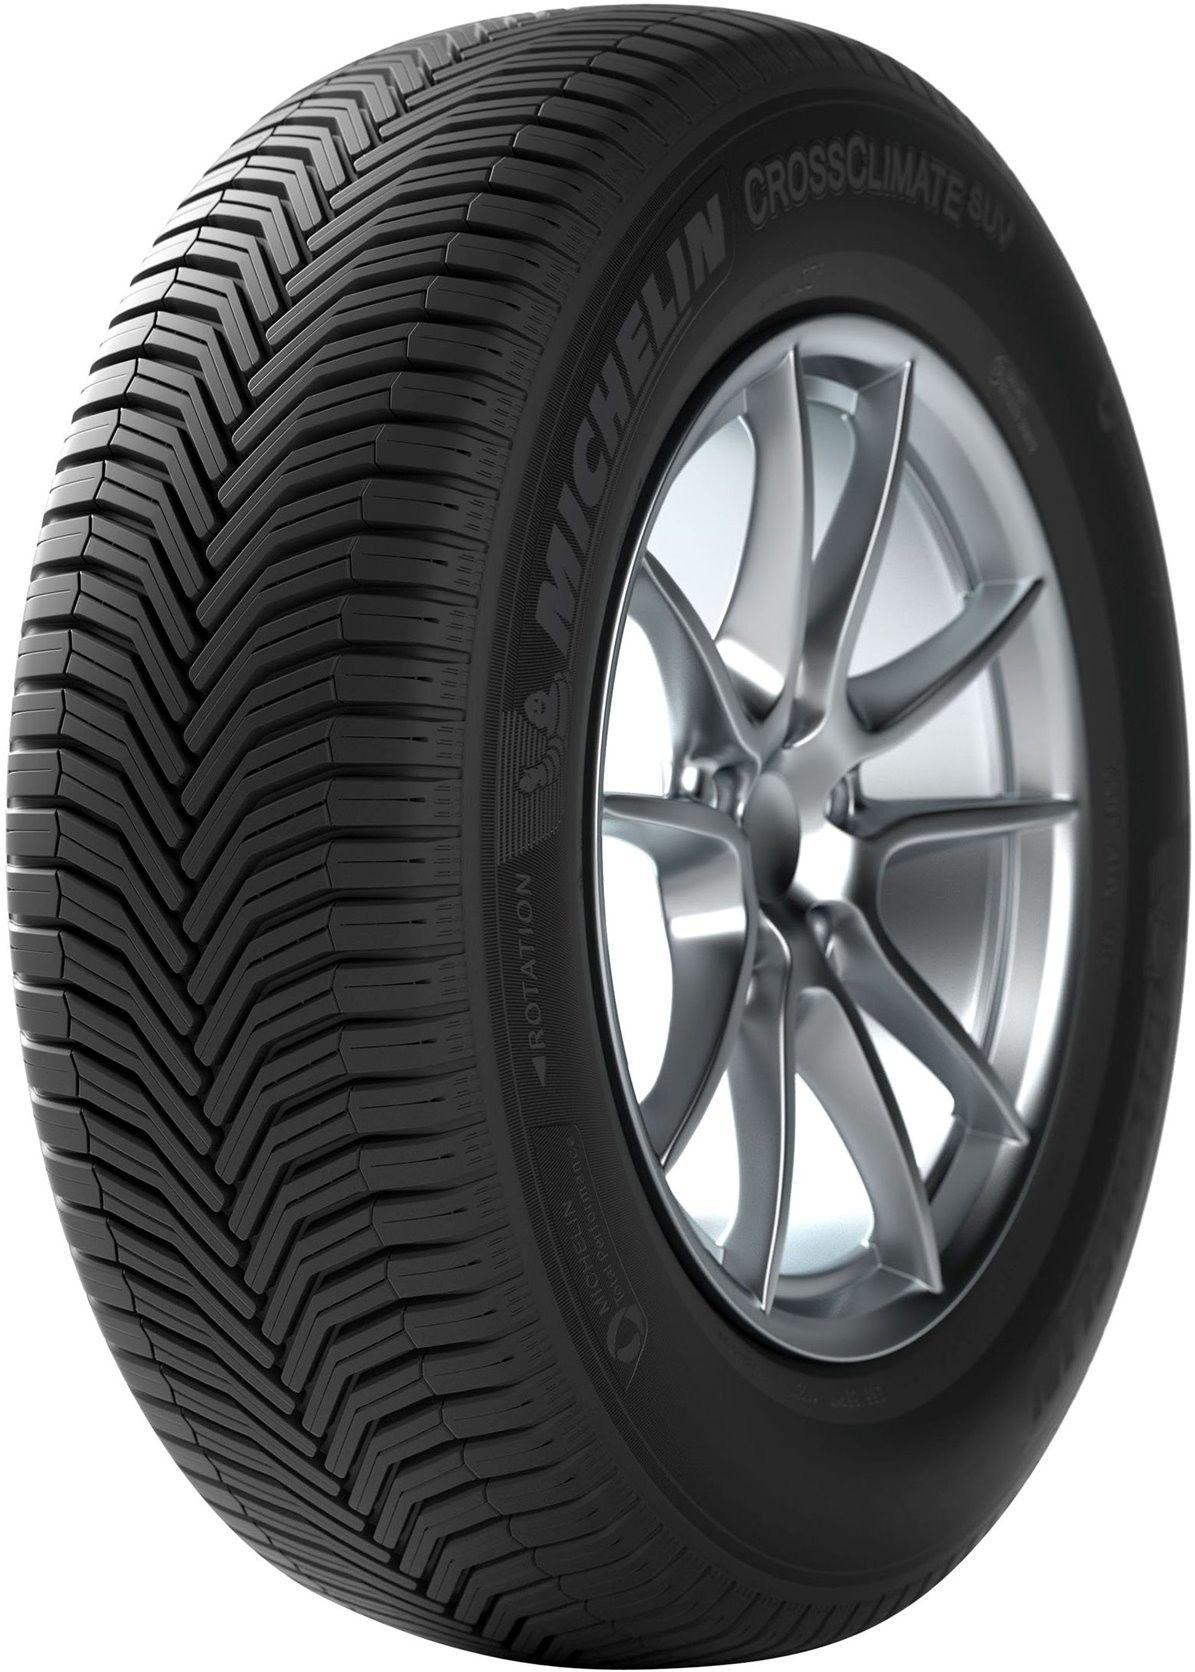 Michelin CROSSCLIMATE 225/65 R17 106 V